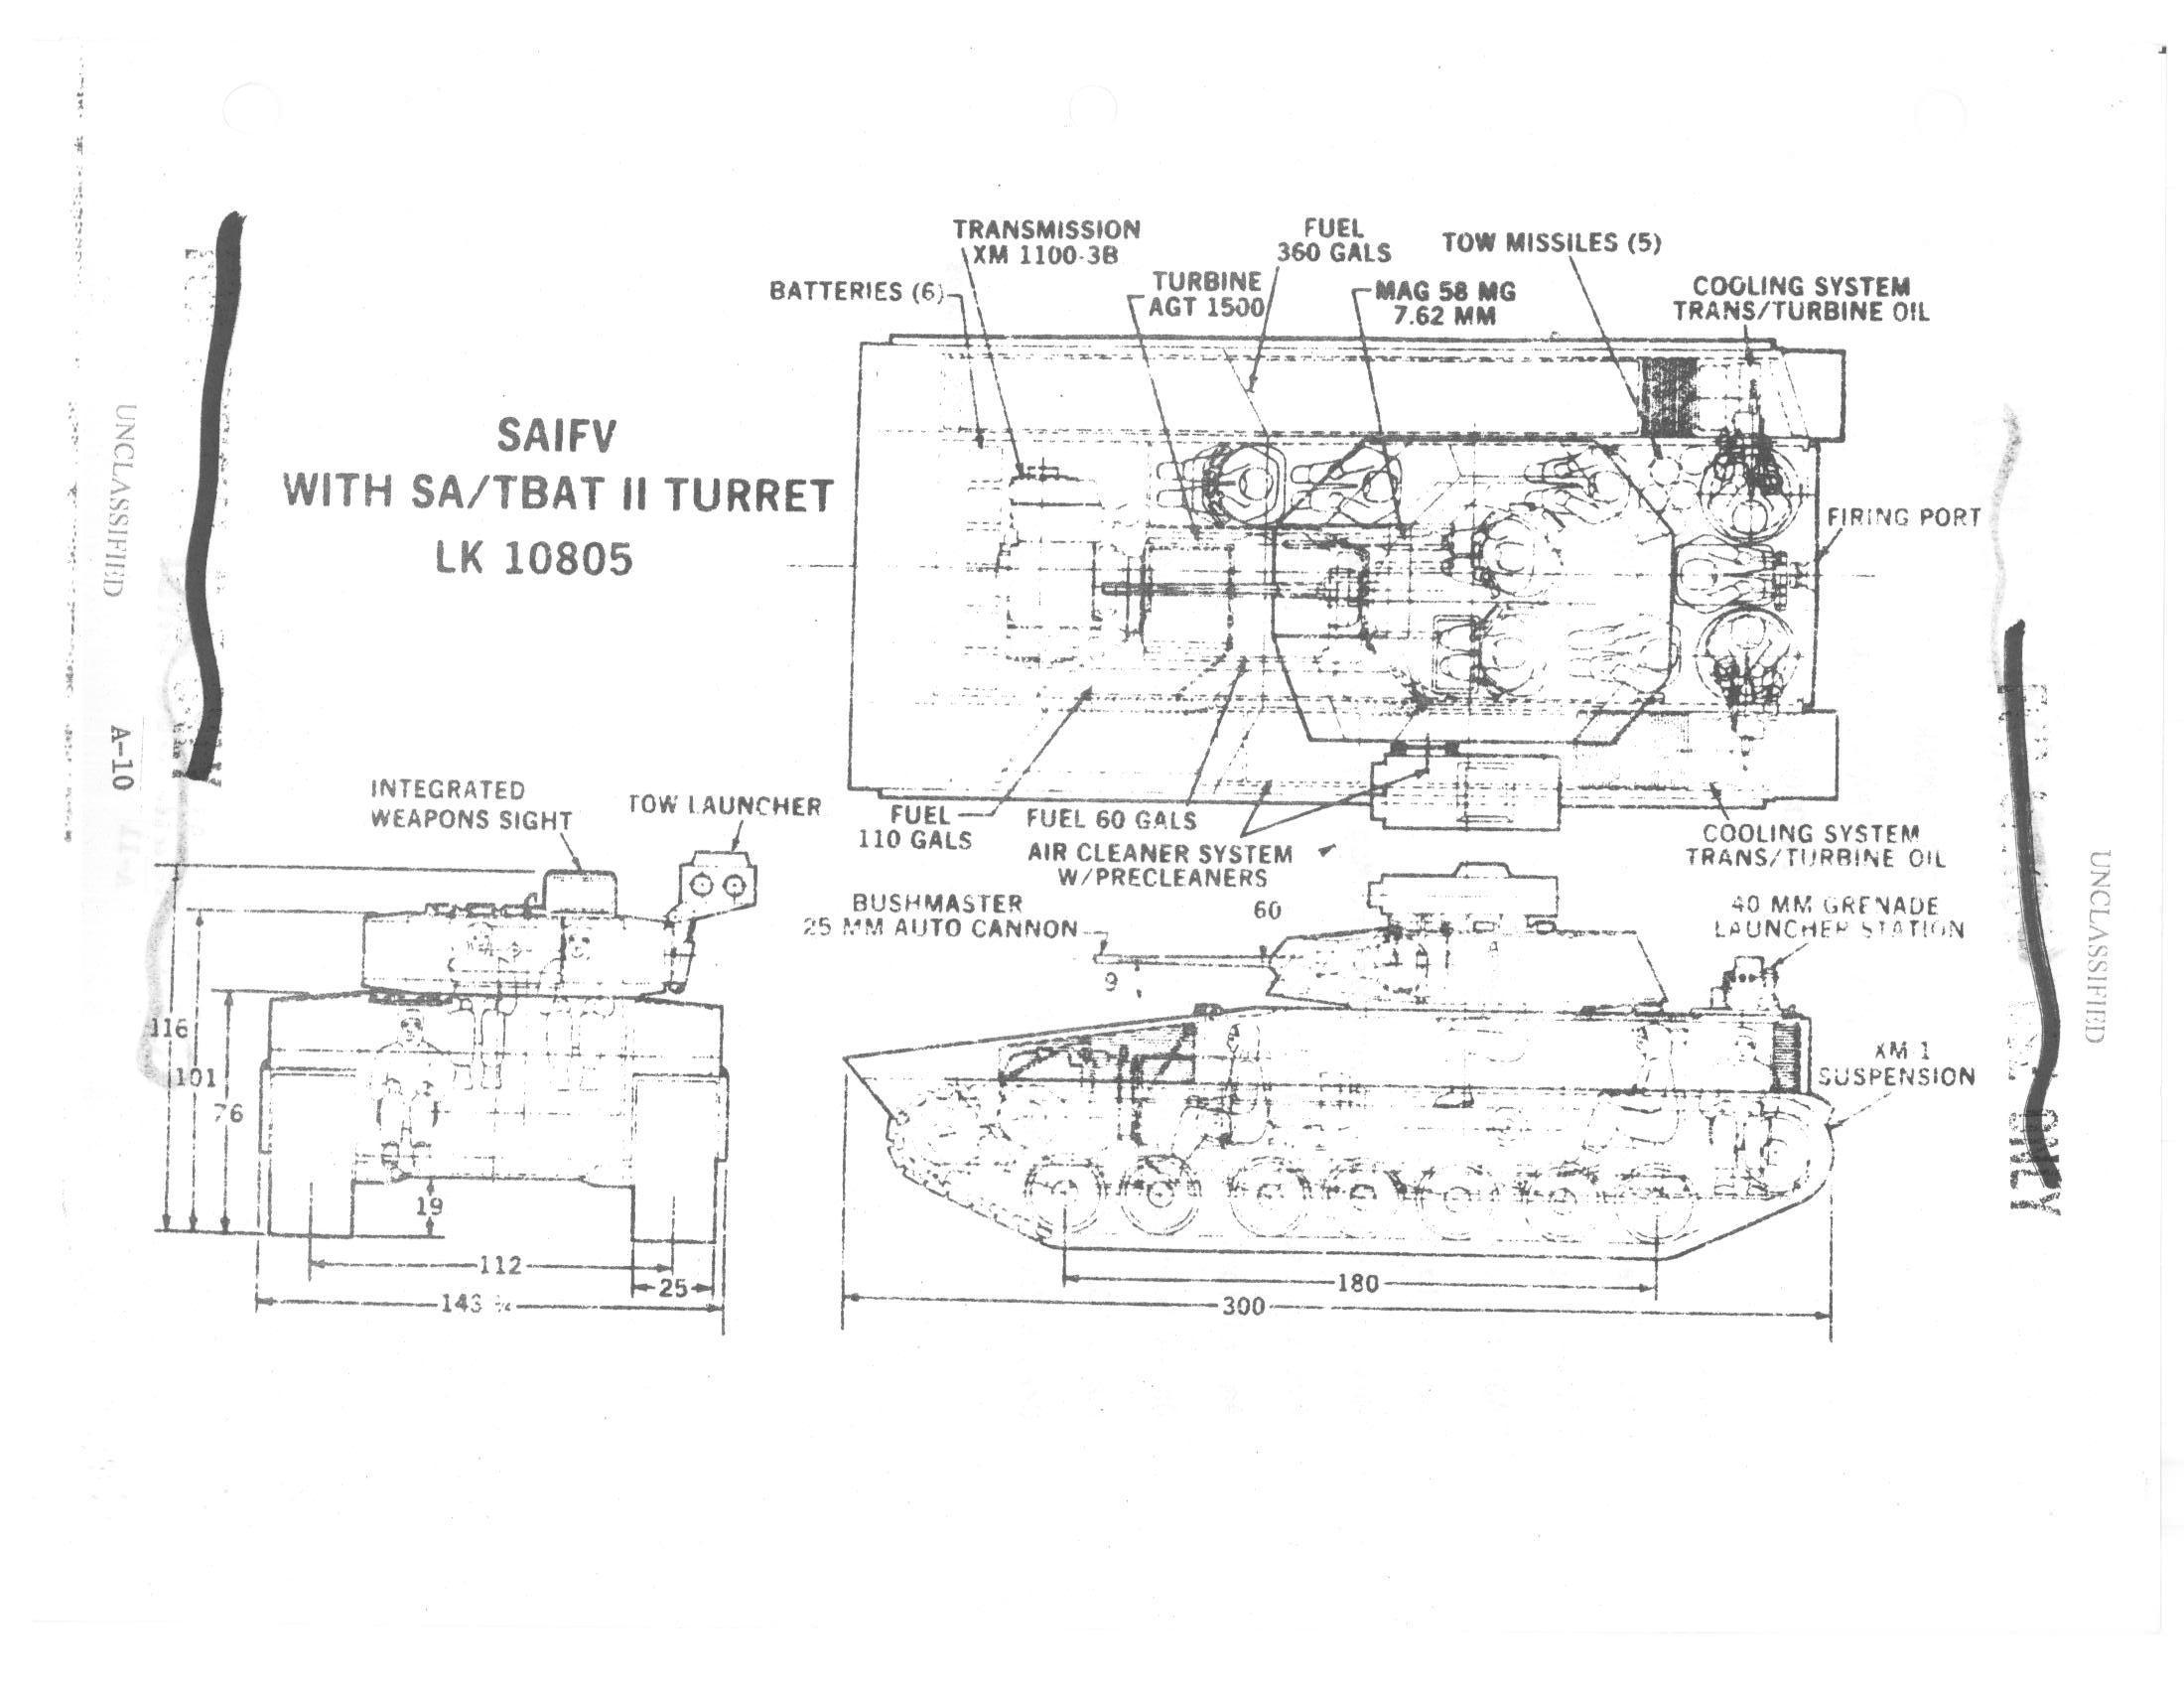 saifv manned turret cutaway